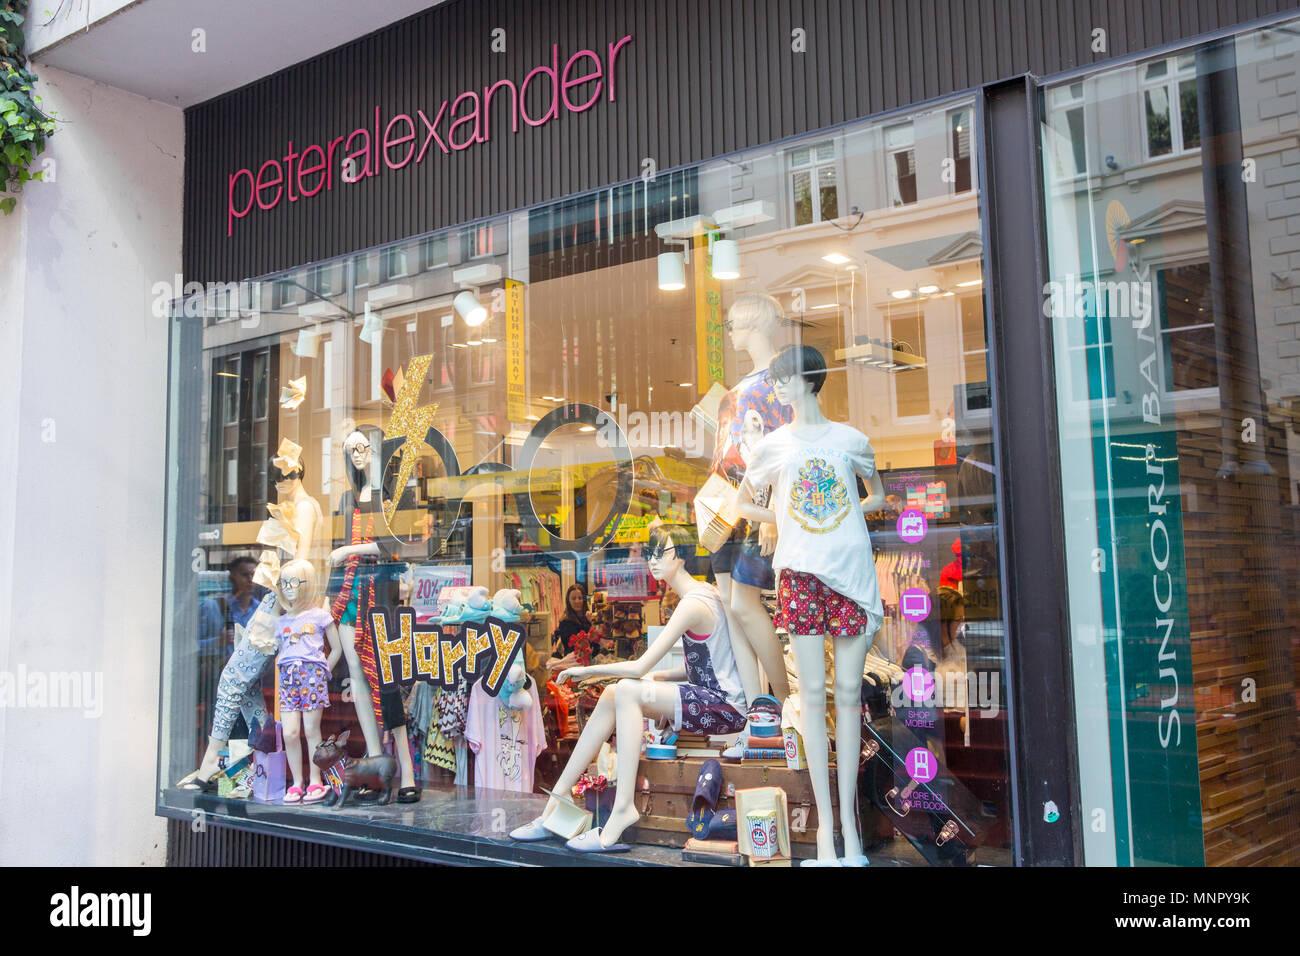 Peter Alexander sleepwear nightwear store in George street Sydney,Australia - Stock Image